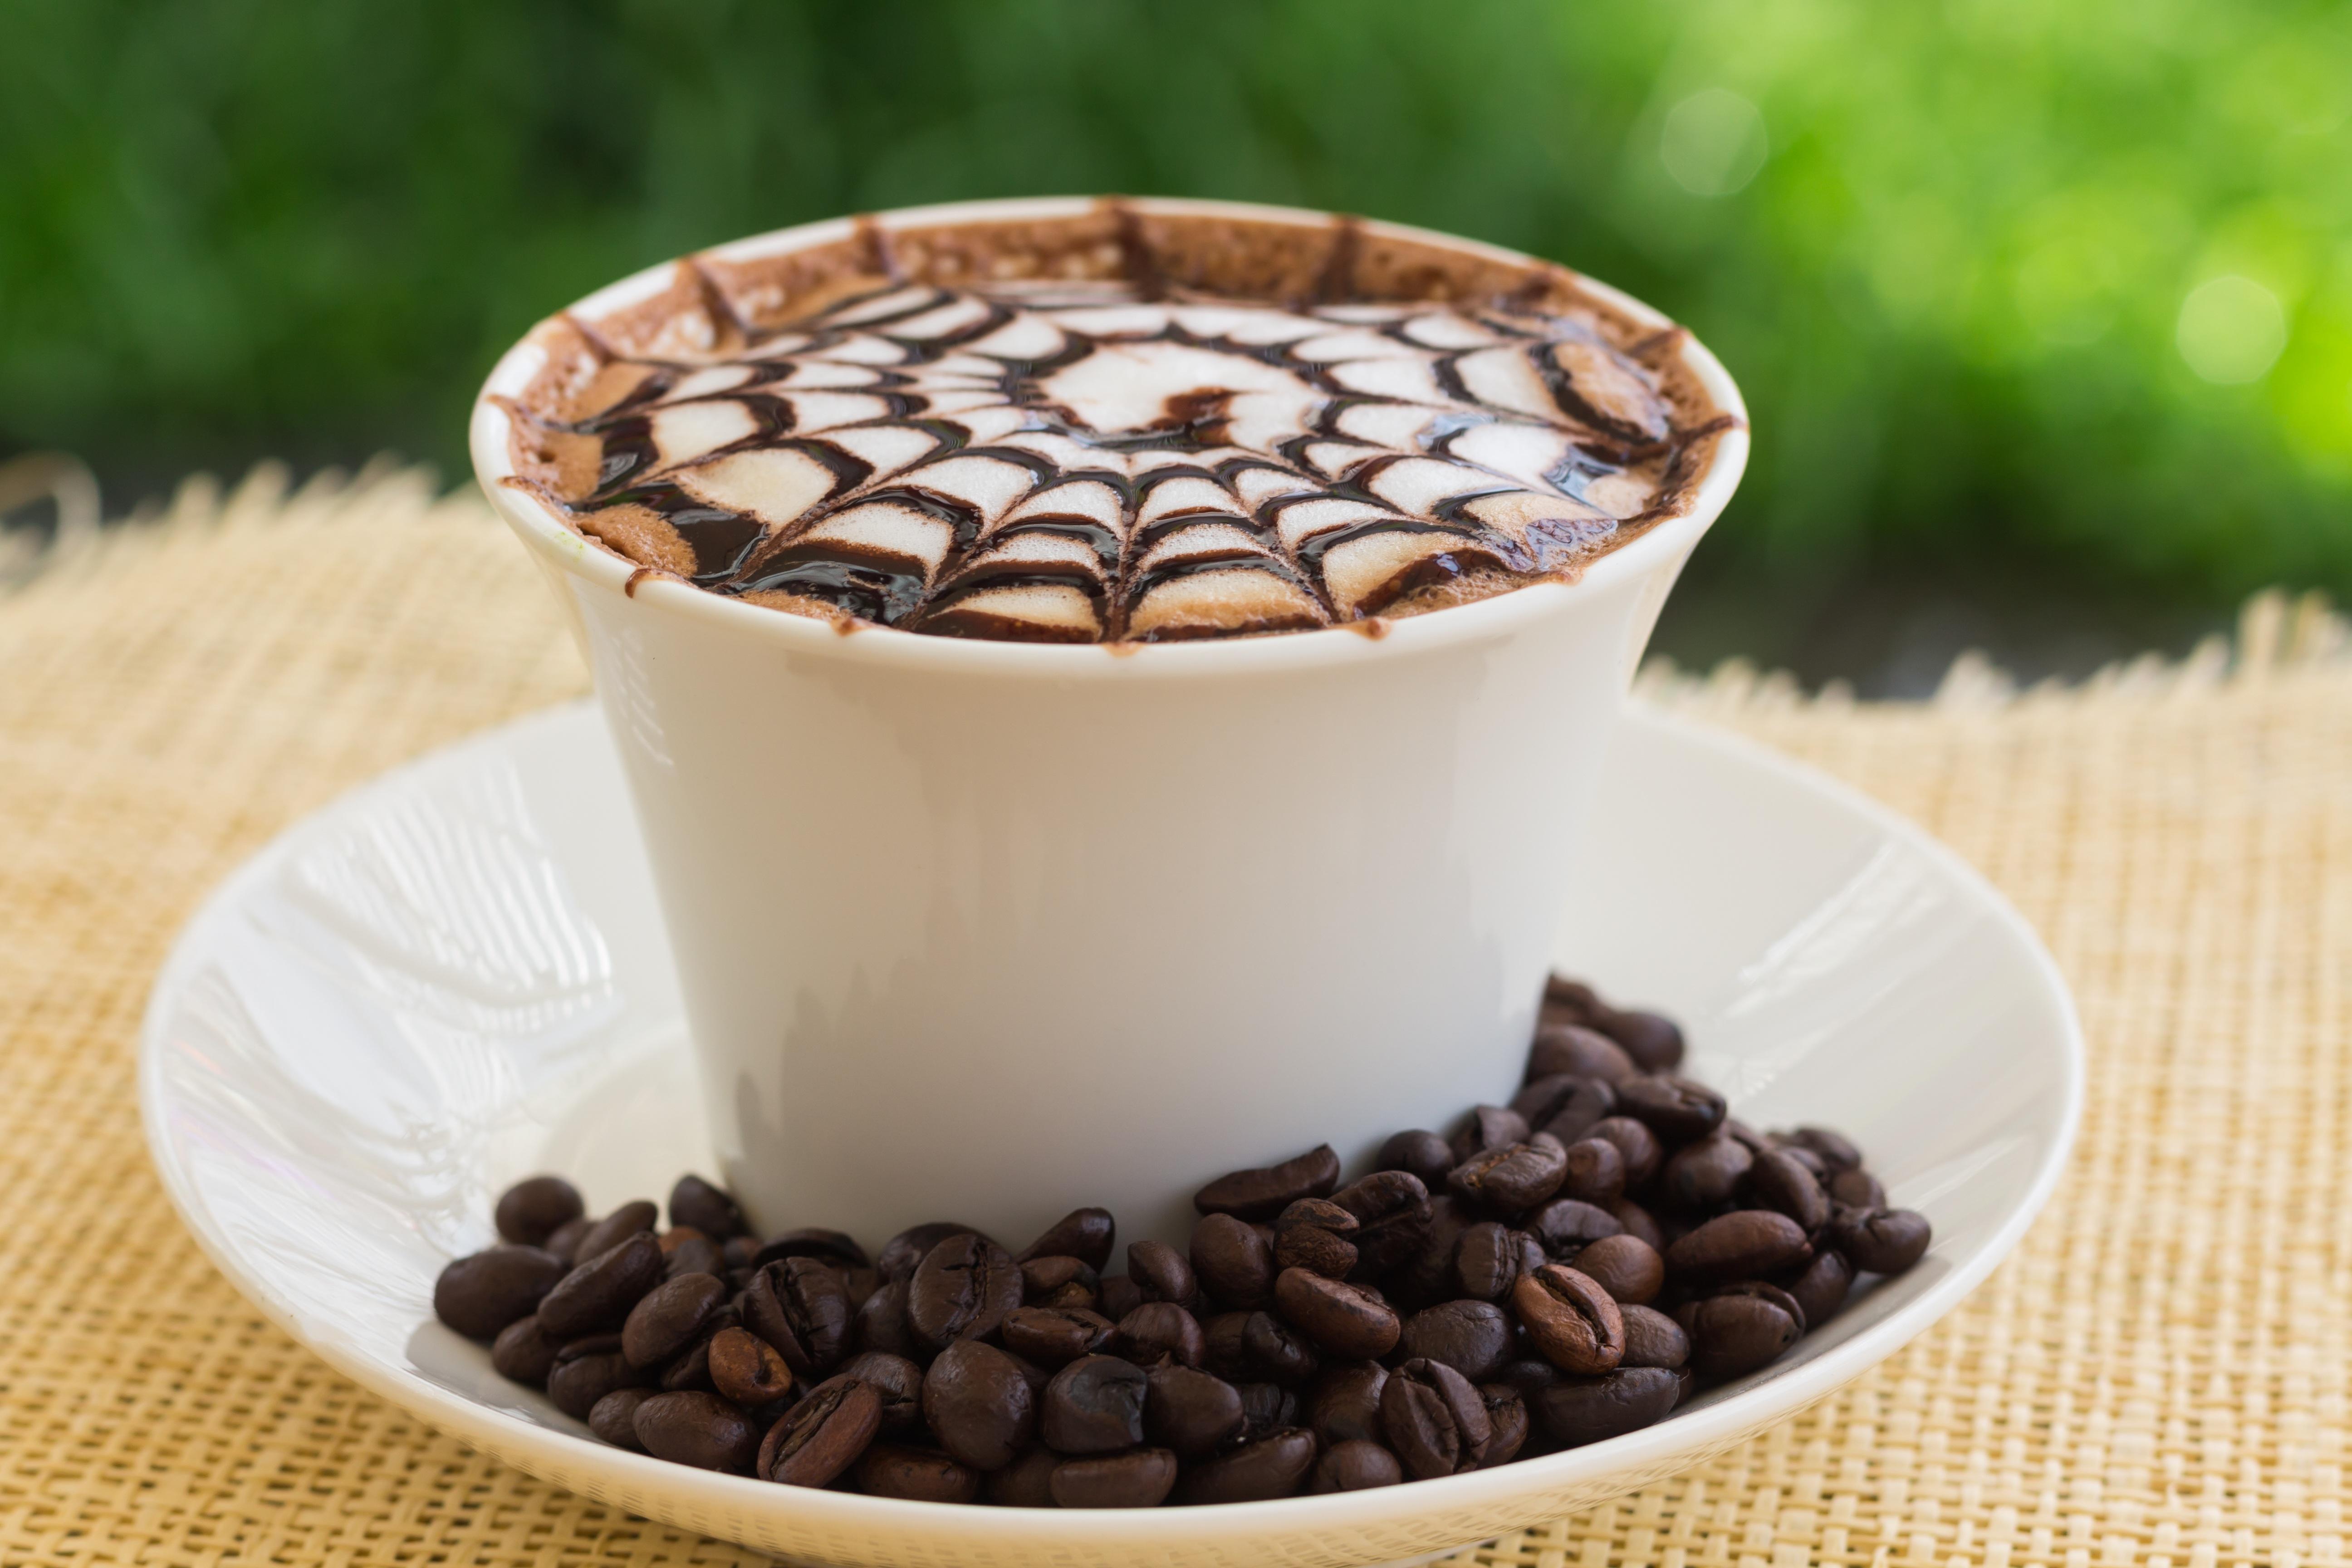 Gambar manis cappuccino pola makanan bersantai menghasilkan gambar manis cappuccino pola makanan bersantai menghasilkan minuman minum susu cangkir kopi lezat gelembung pagi pagi kafein seni liburan thecheapjerseys Gallery